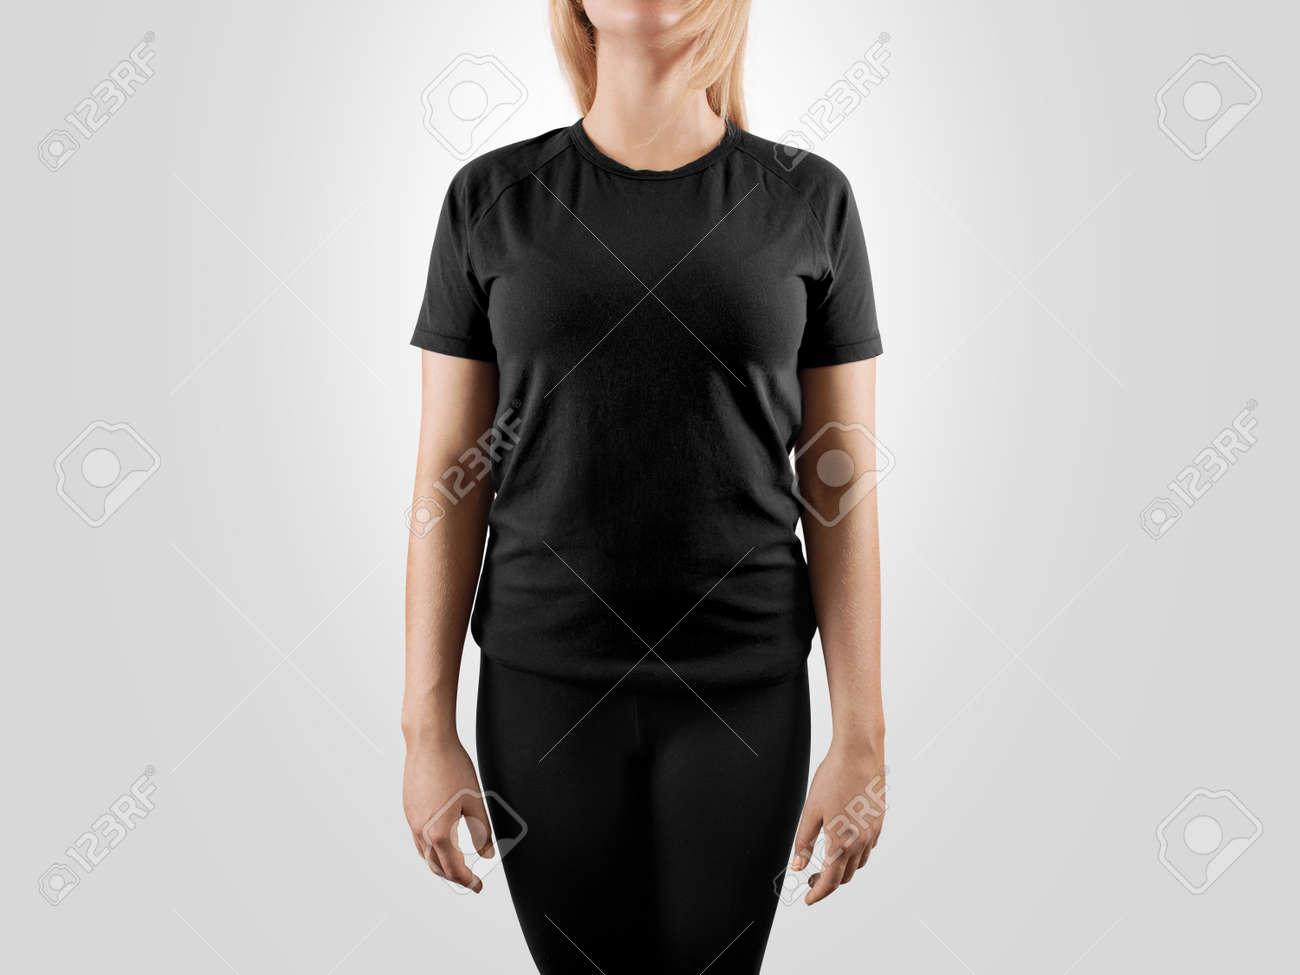 Black t shirt template - Download